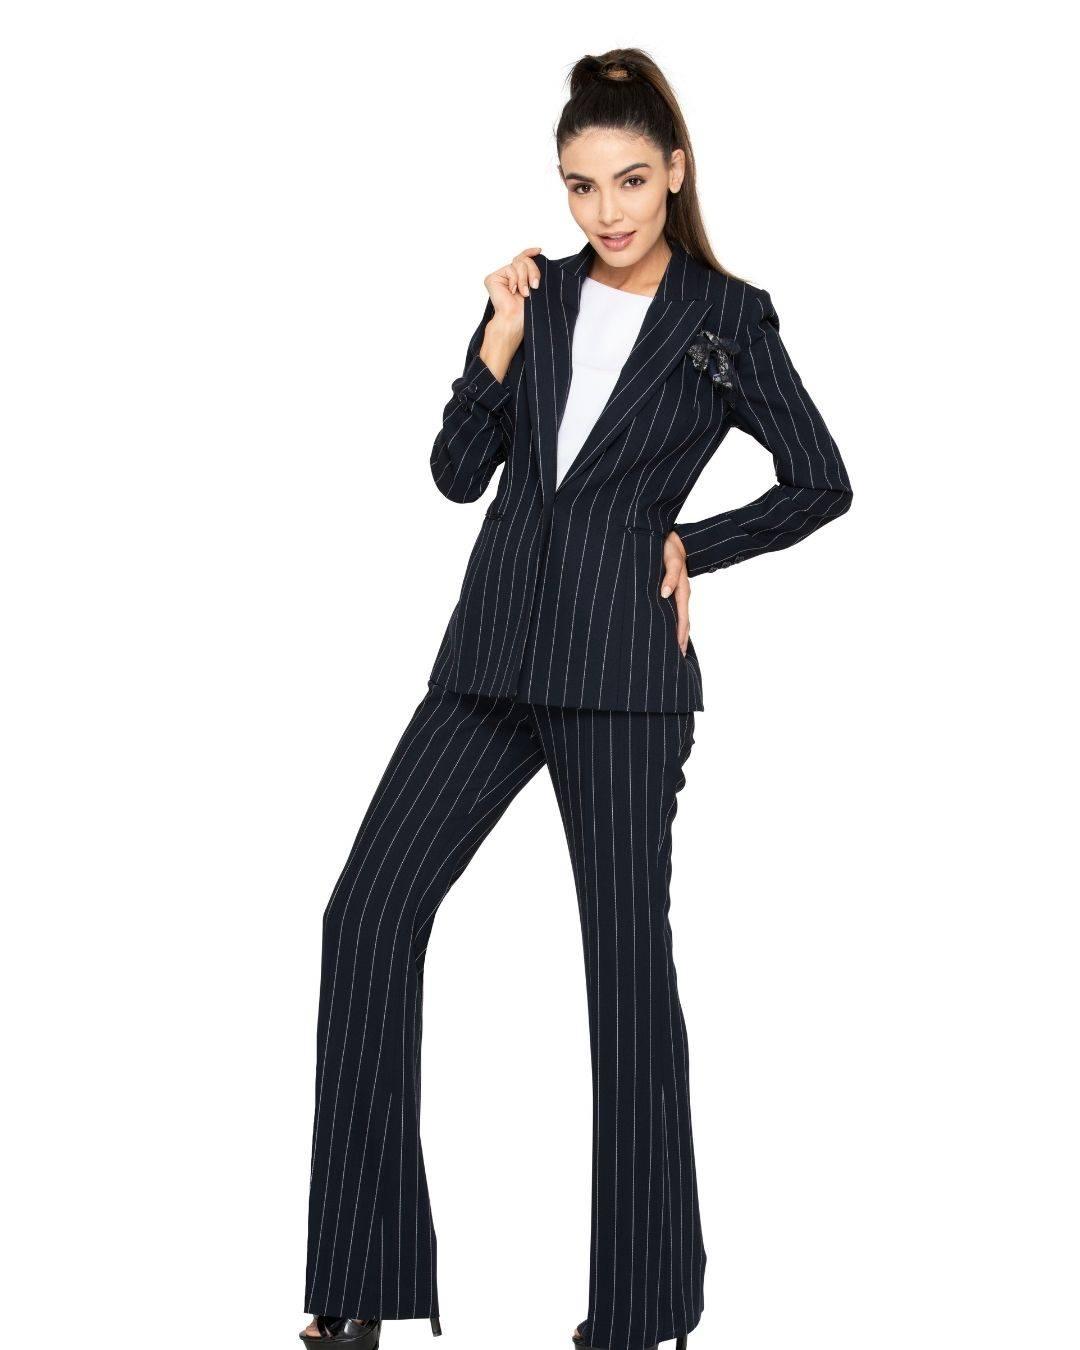 Susanna Beverly Hills Luxury Fall & Winter Looks, Luxury Women's Fashion